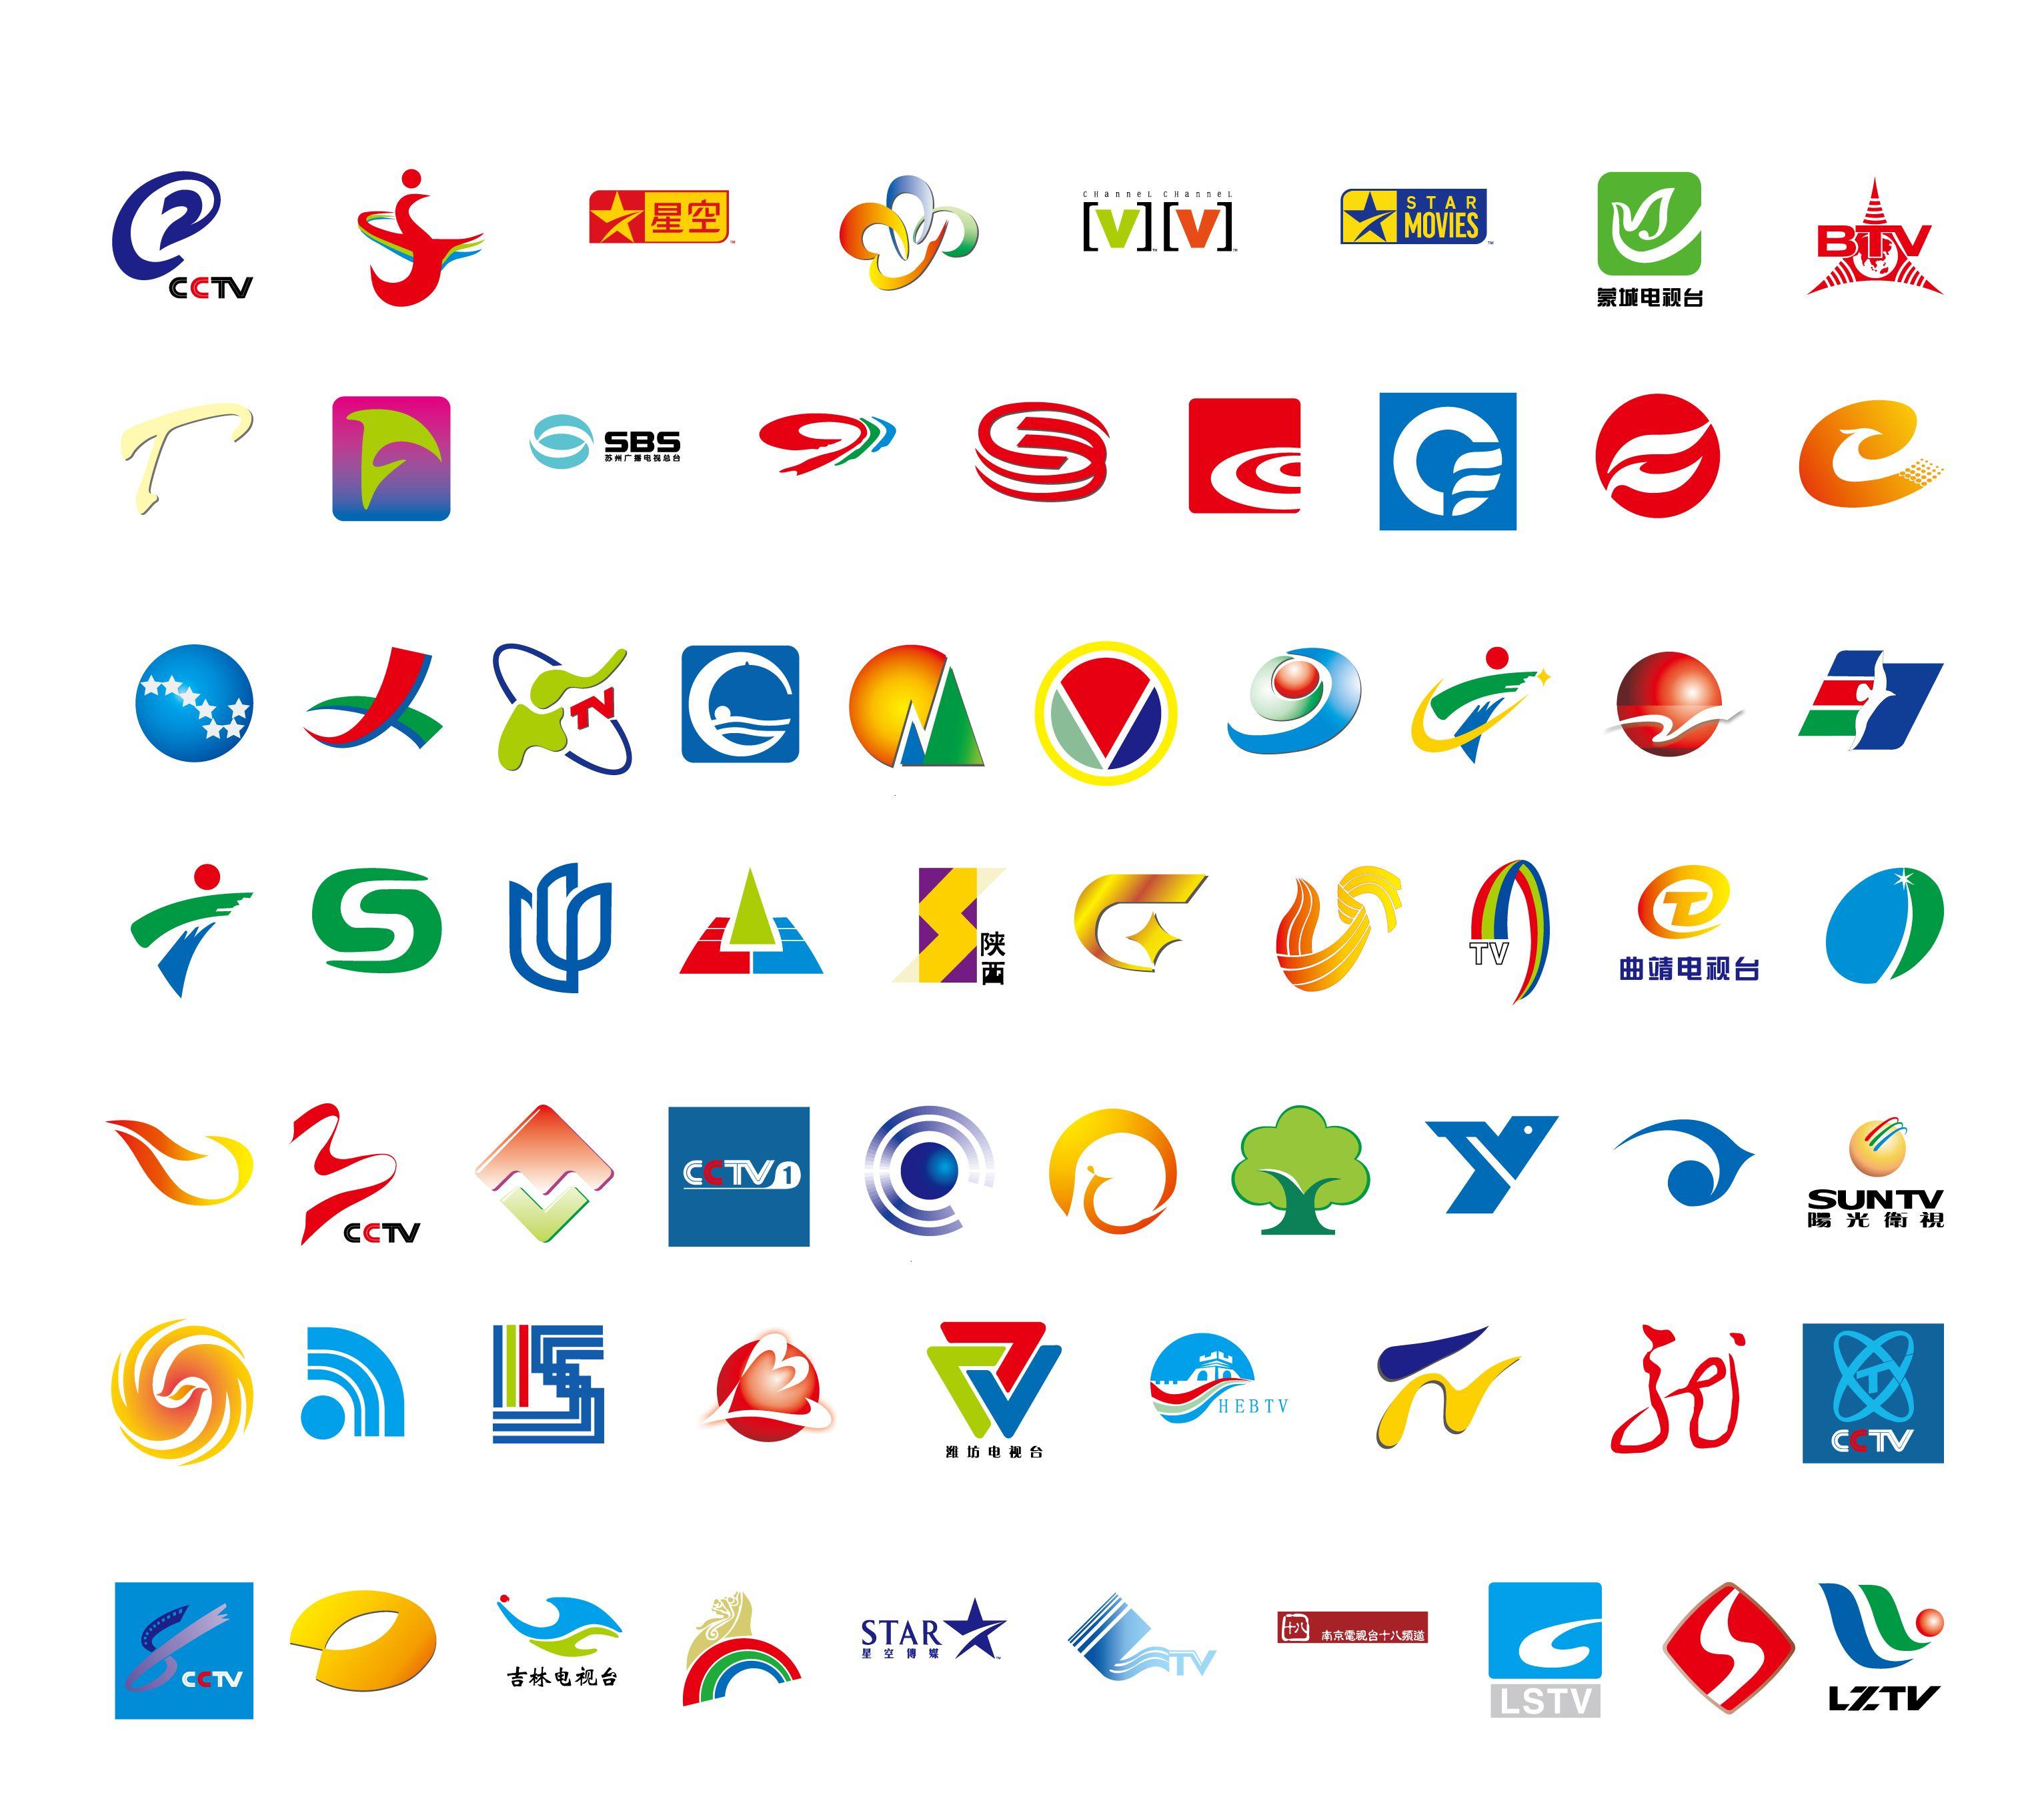 free vector logo   Places to Visit   Pinterest   Logos